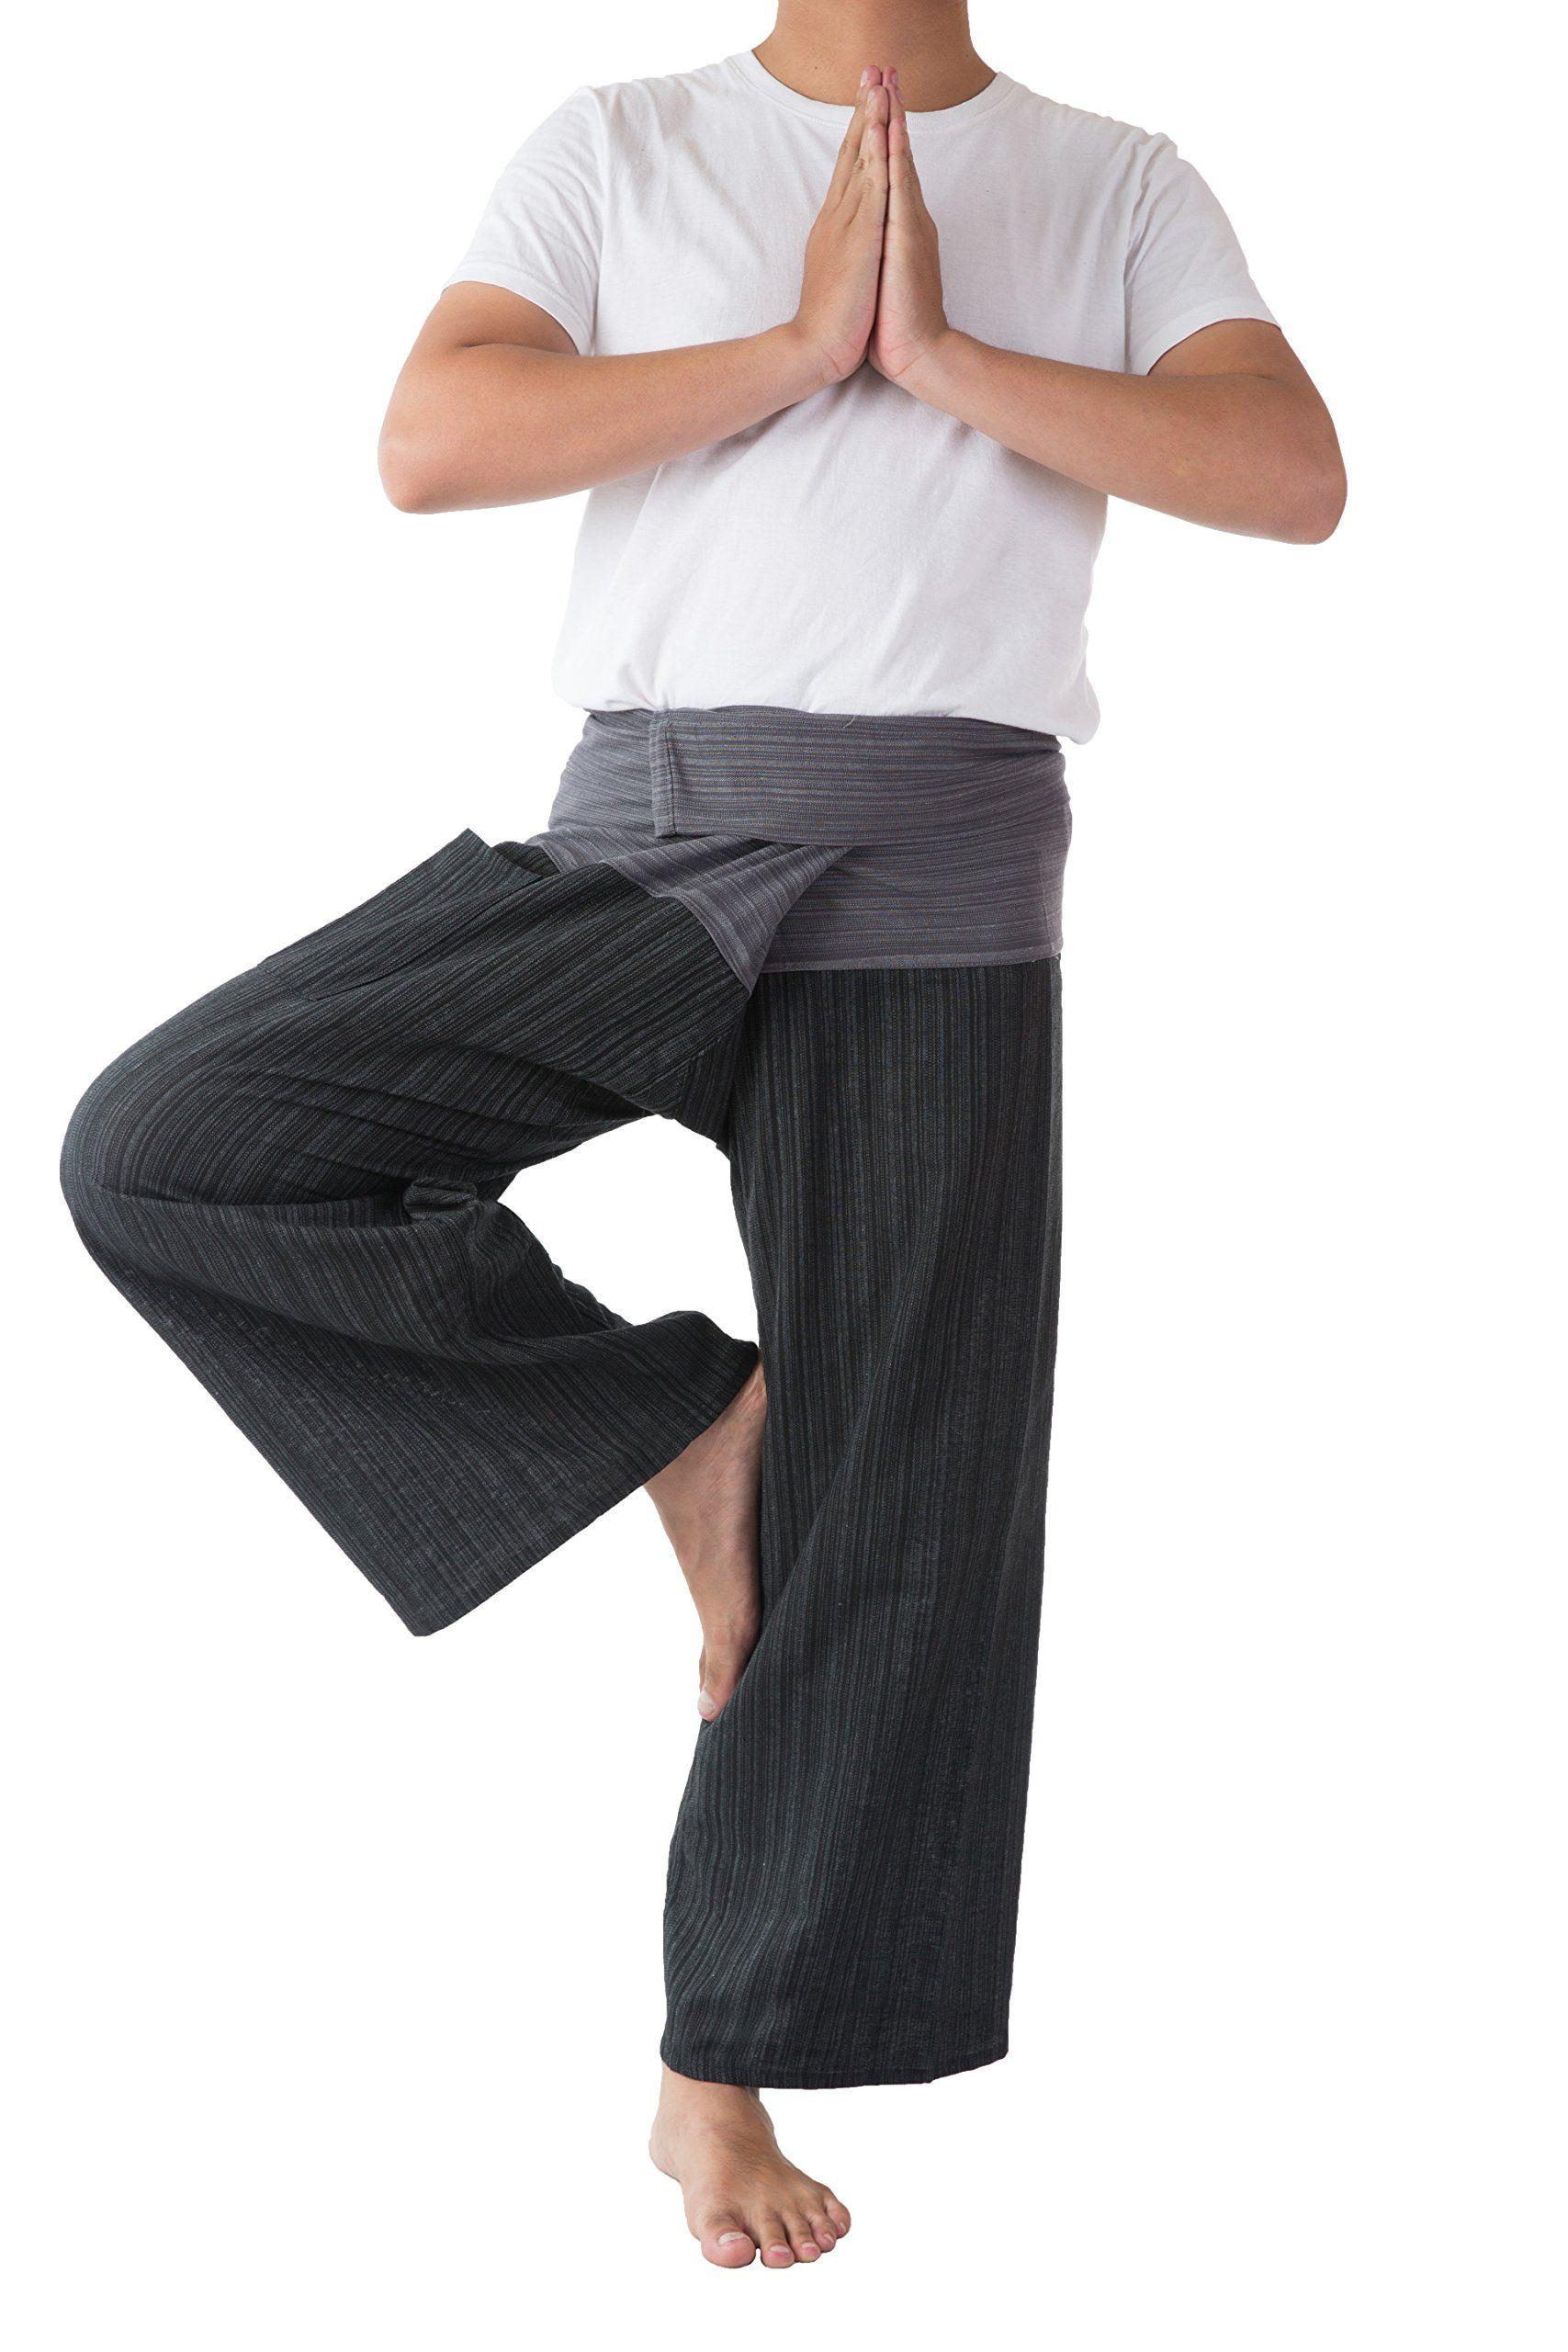 0d2f806a66 Thai Fisherman Pants Men's Yoga Trousers Gray and Charcoal 2 Tone Pant (Free  Size)